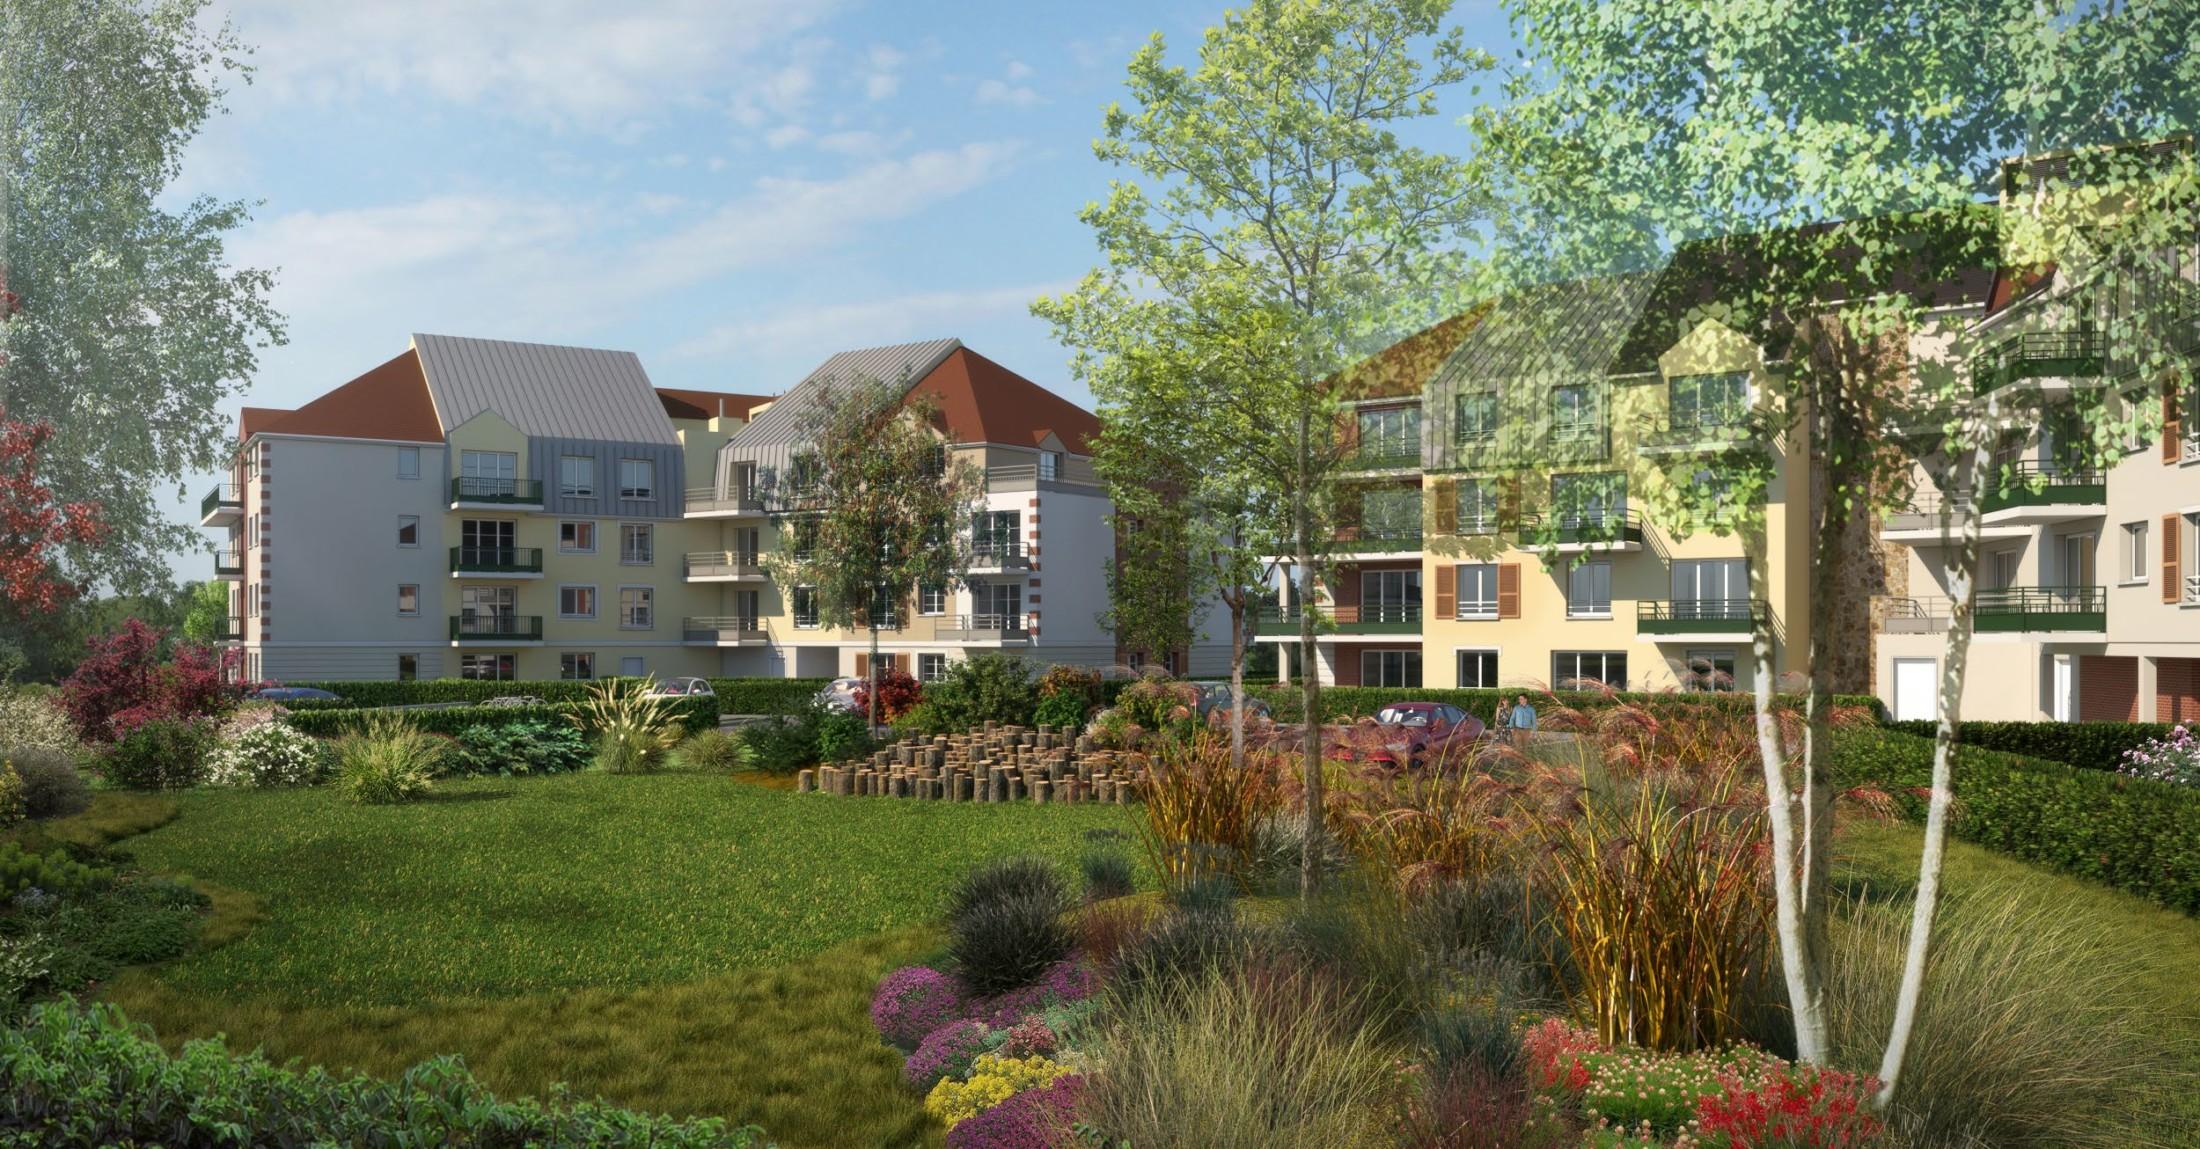 Logement-ZAC-urbain-jardin-paysage